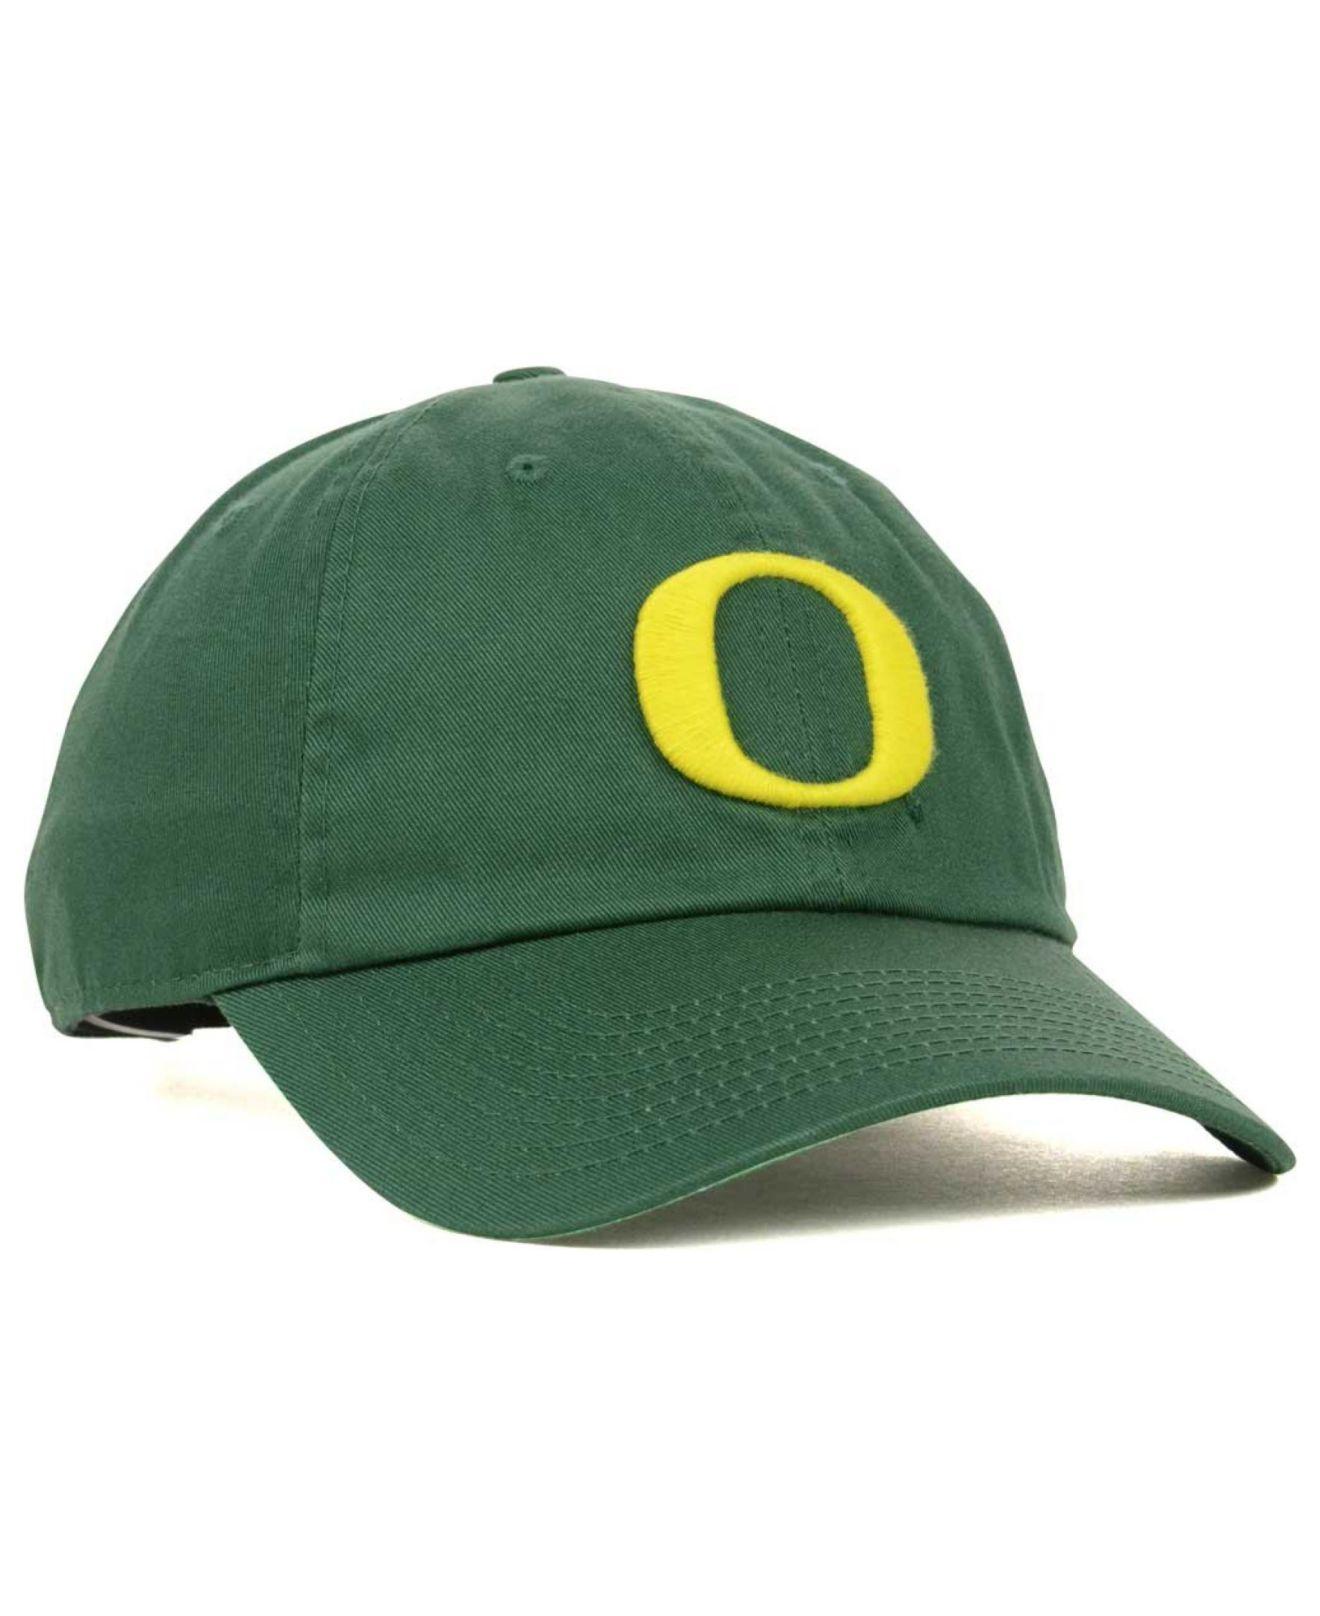 e486d364950 Lyst - Nike Oregon Ducks Dri-Fit Tailback Cap in Green for Men